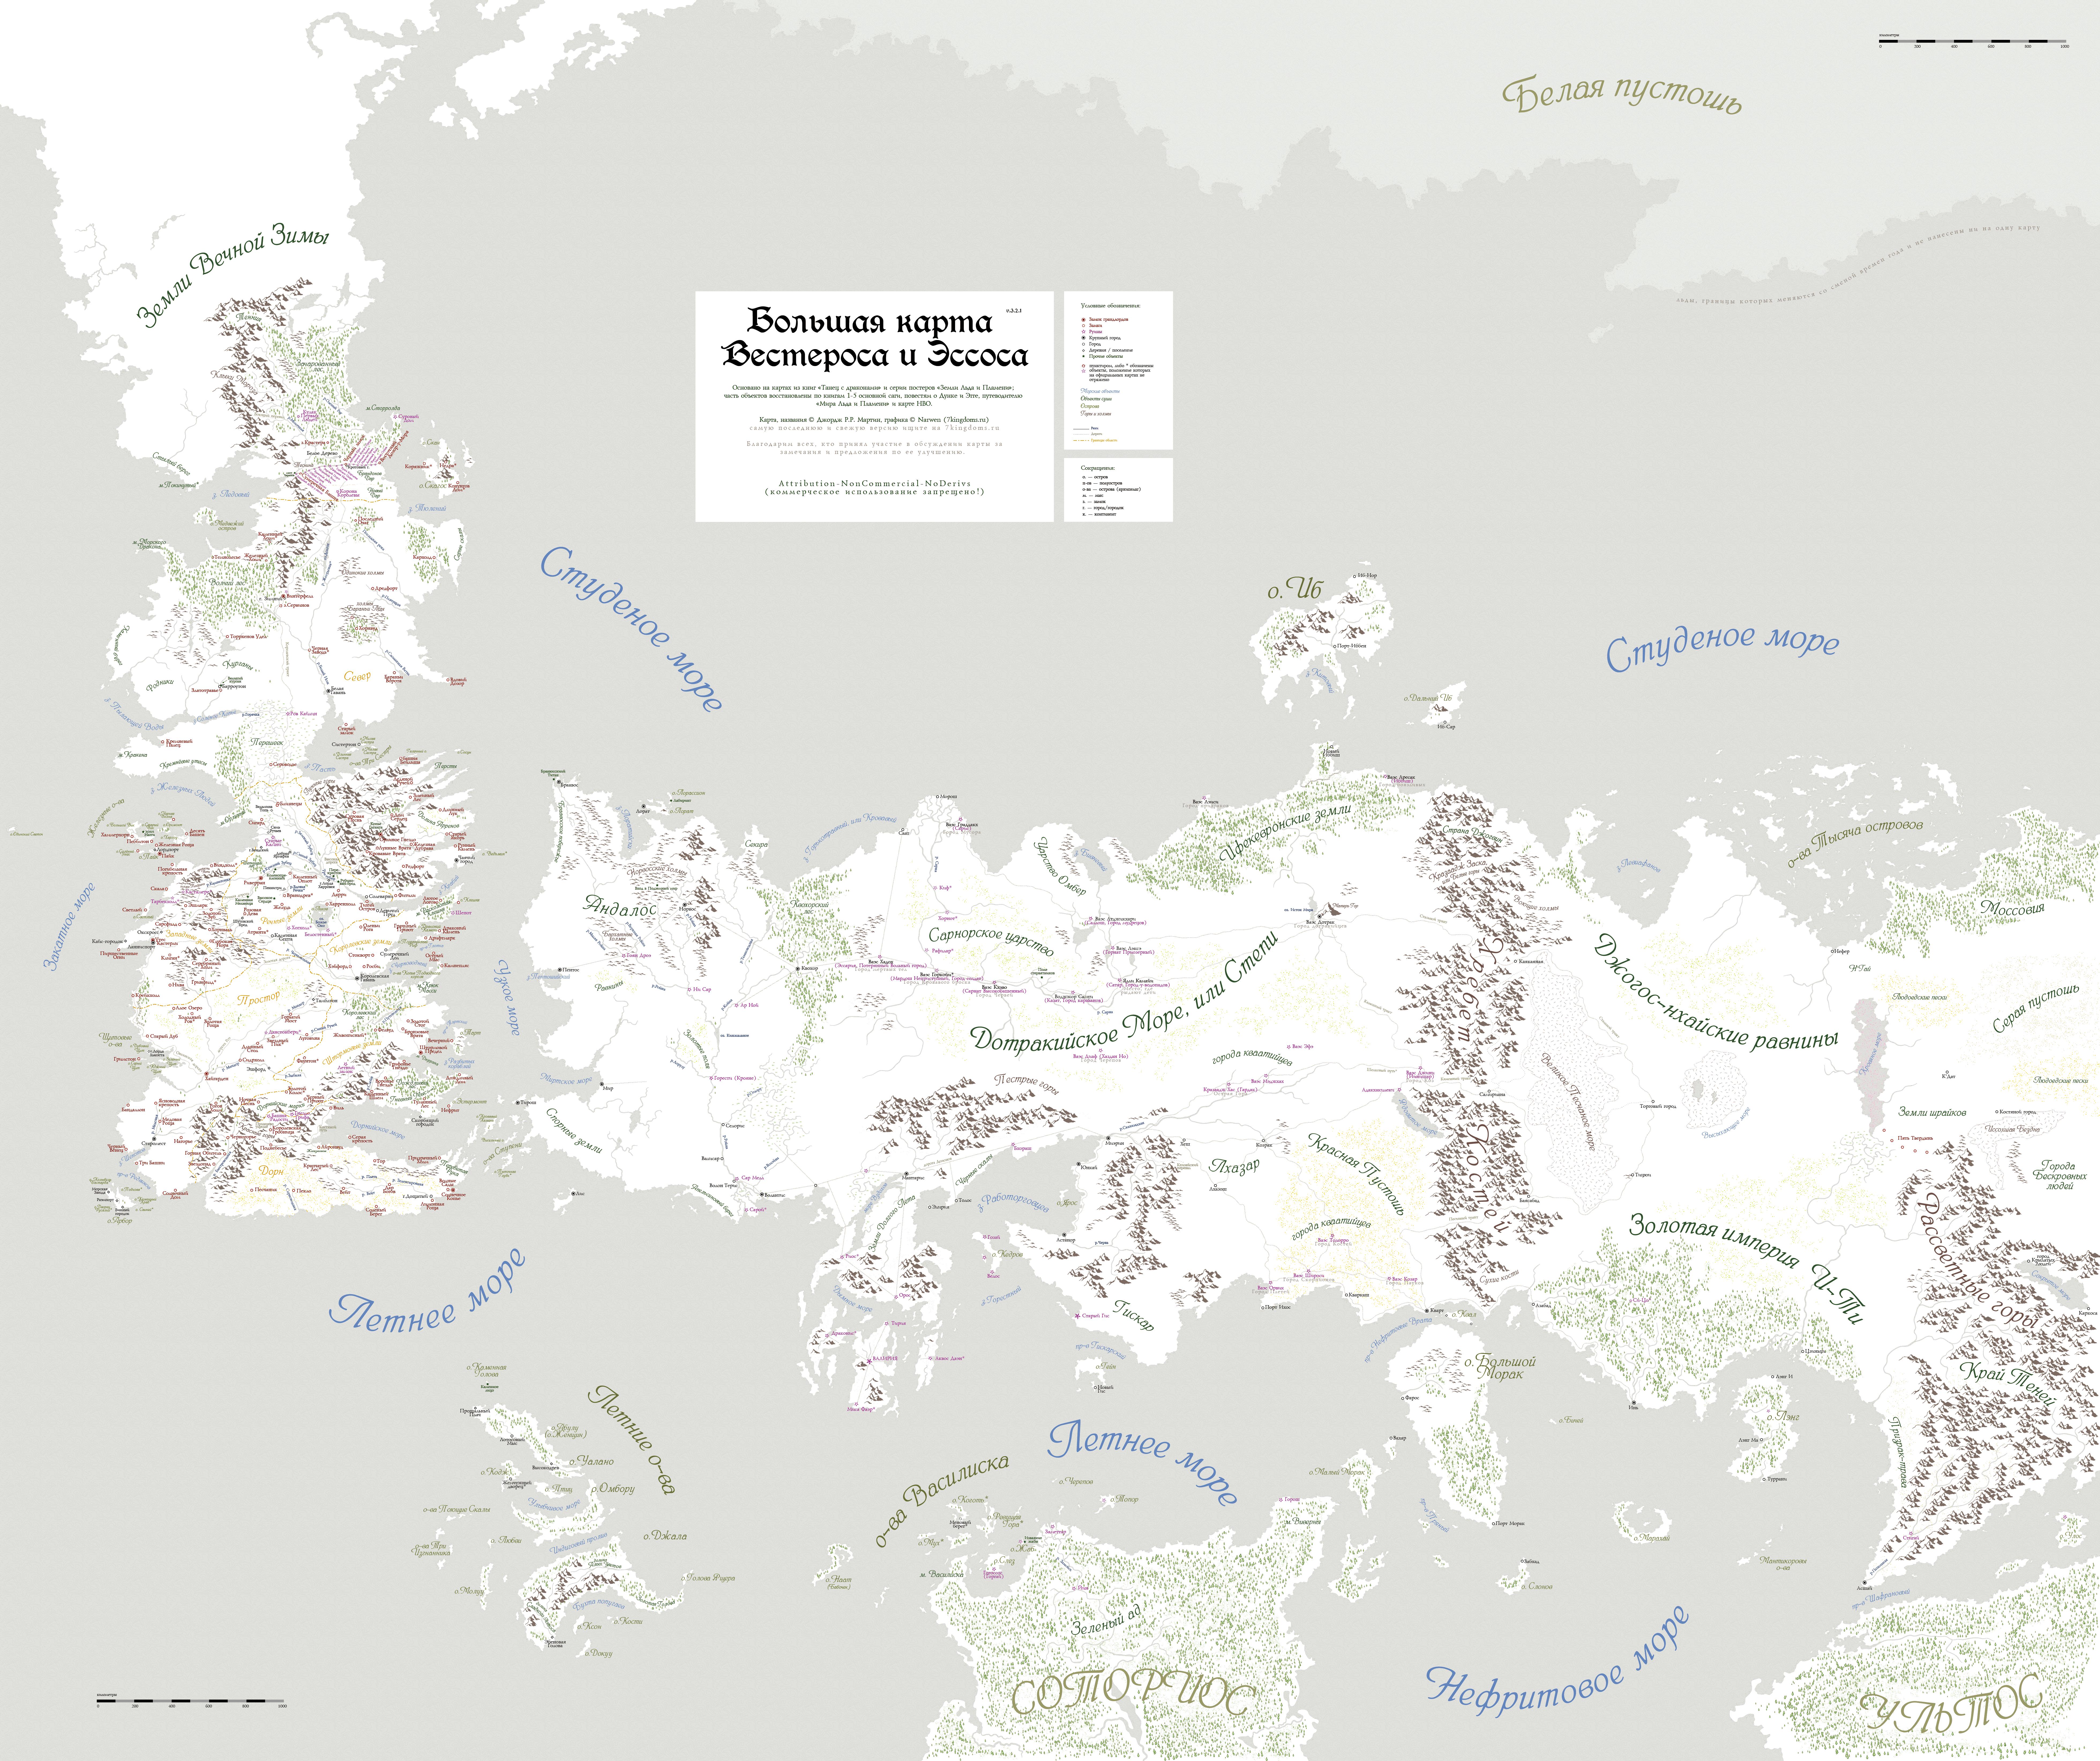 http://7kingdoms.ru/wp-content/uploads/2015/03/westeros-essos-map-v3-2-2.png